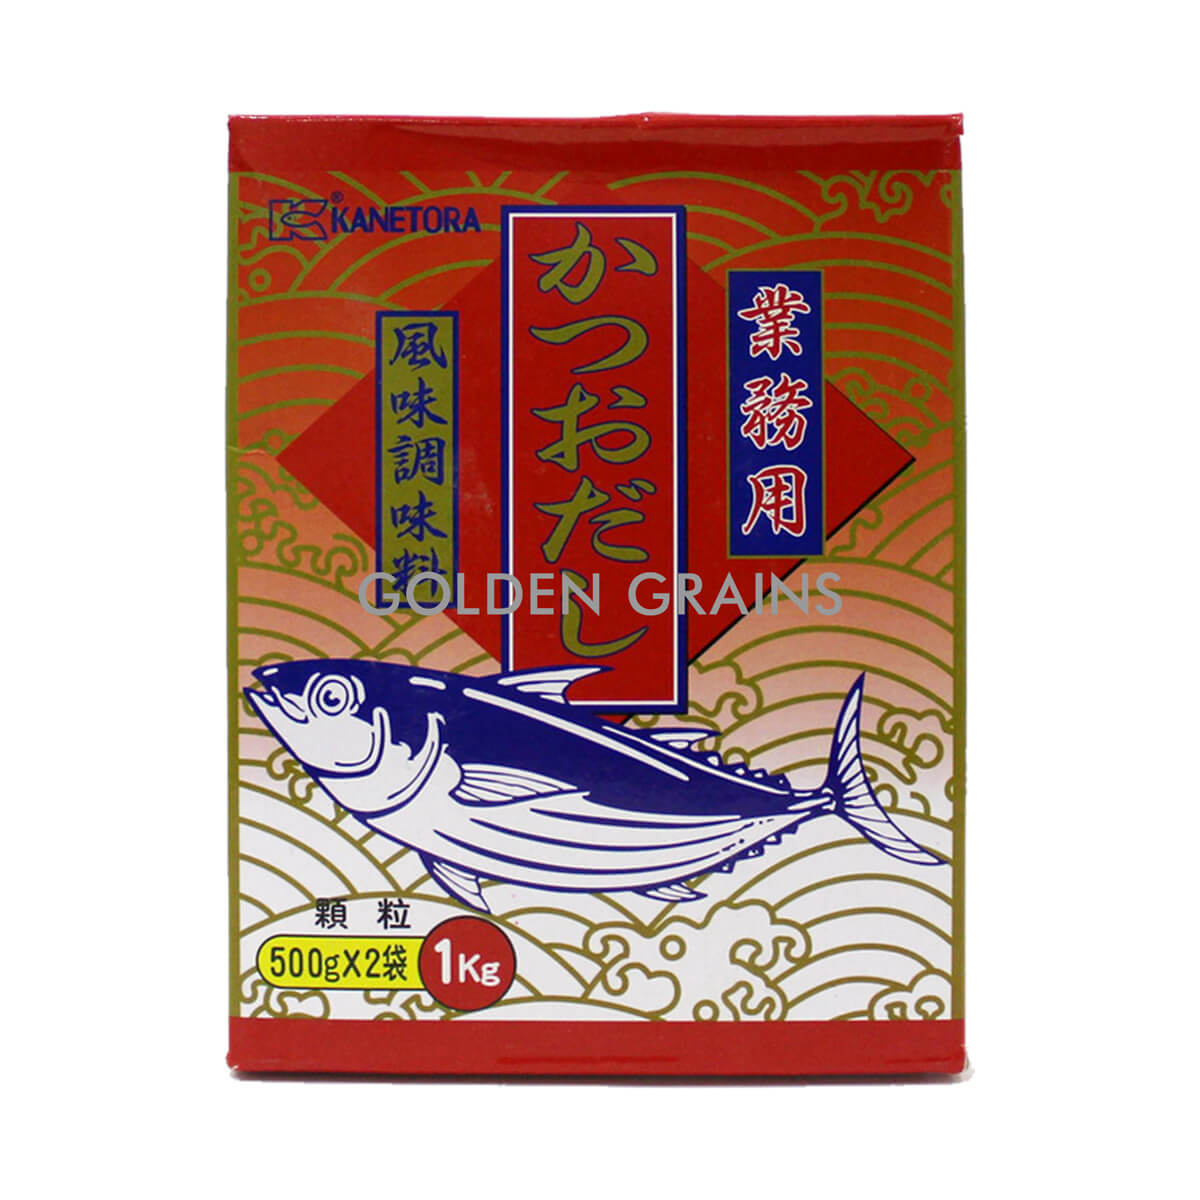 Golden Grains Kanetora - Hondashi - Front.jpg